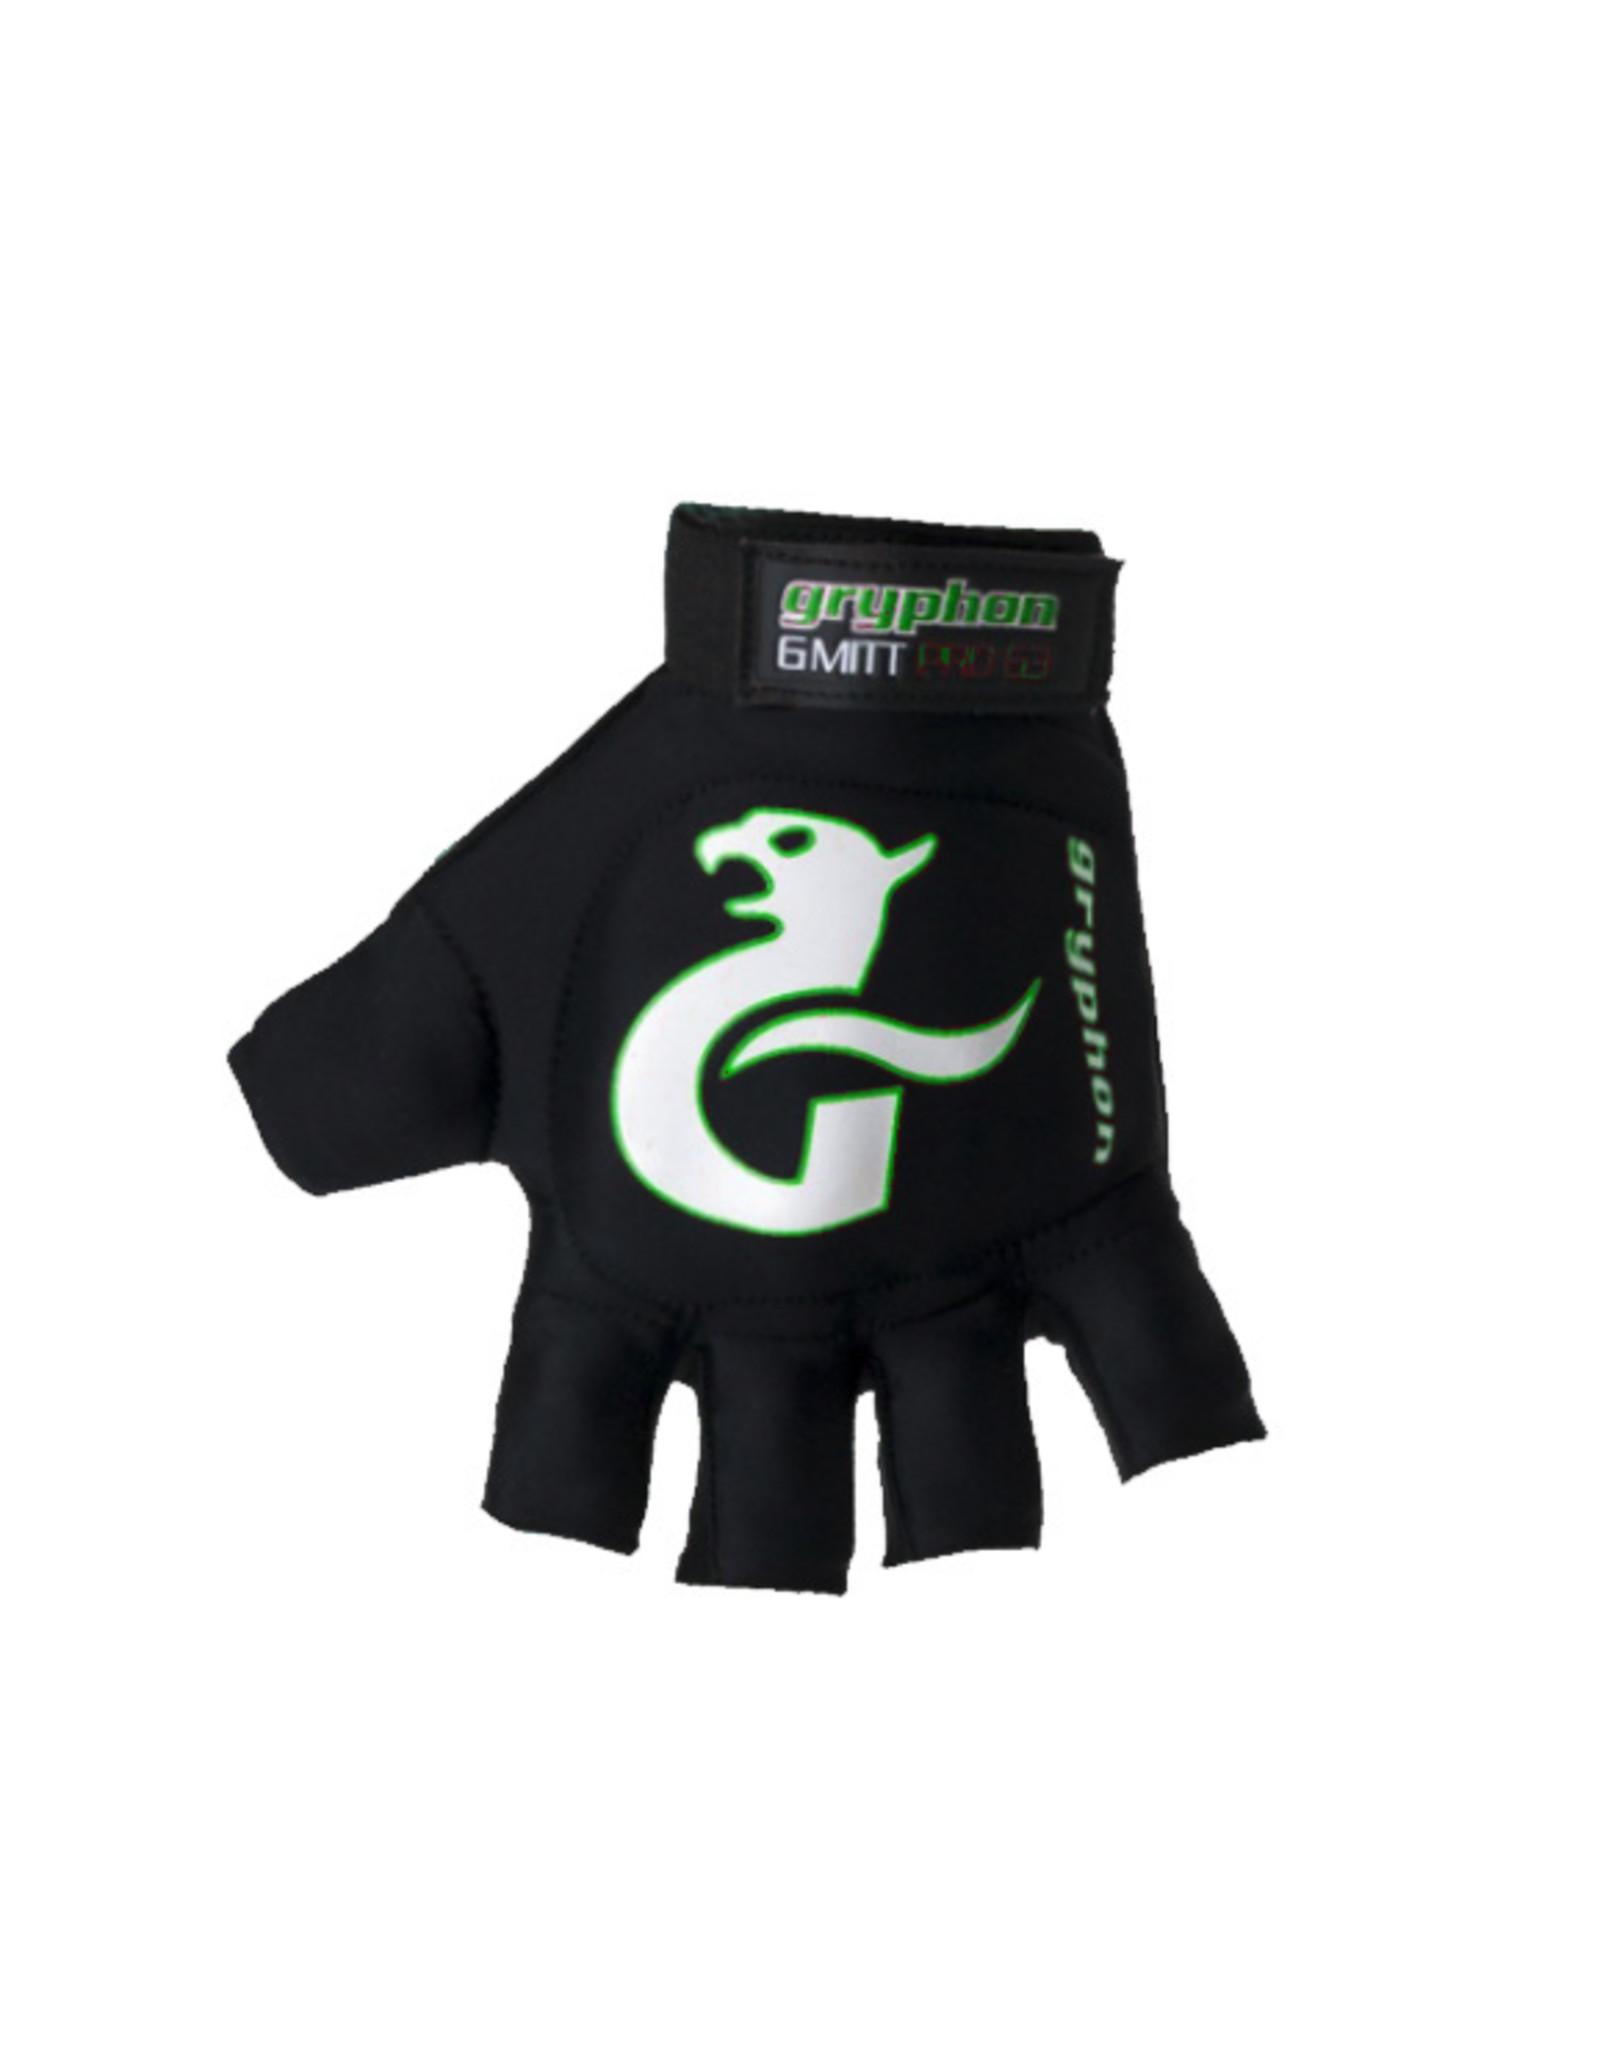 Gryphon G-Mitt left hand